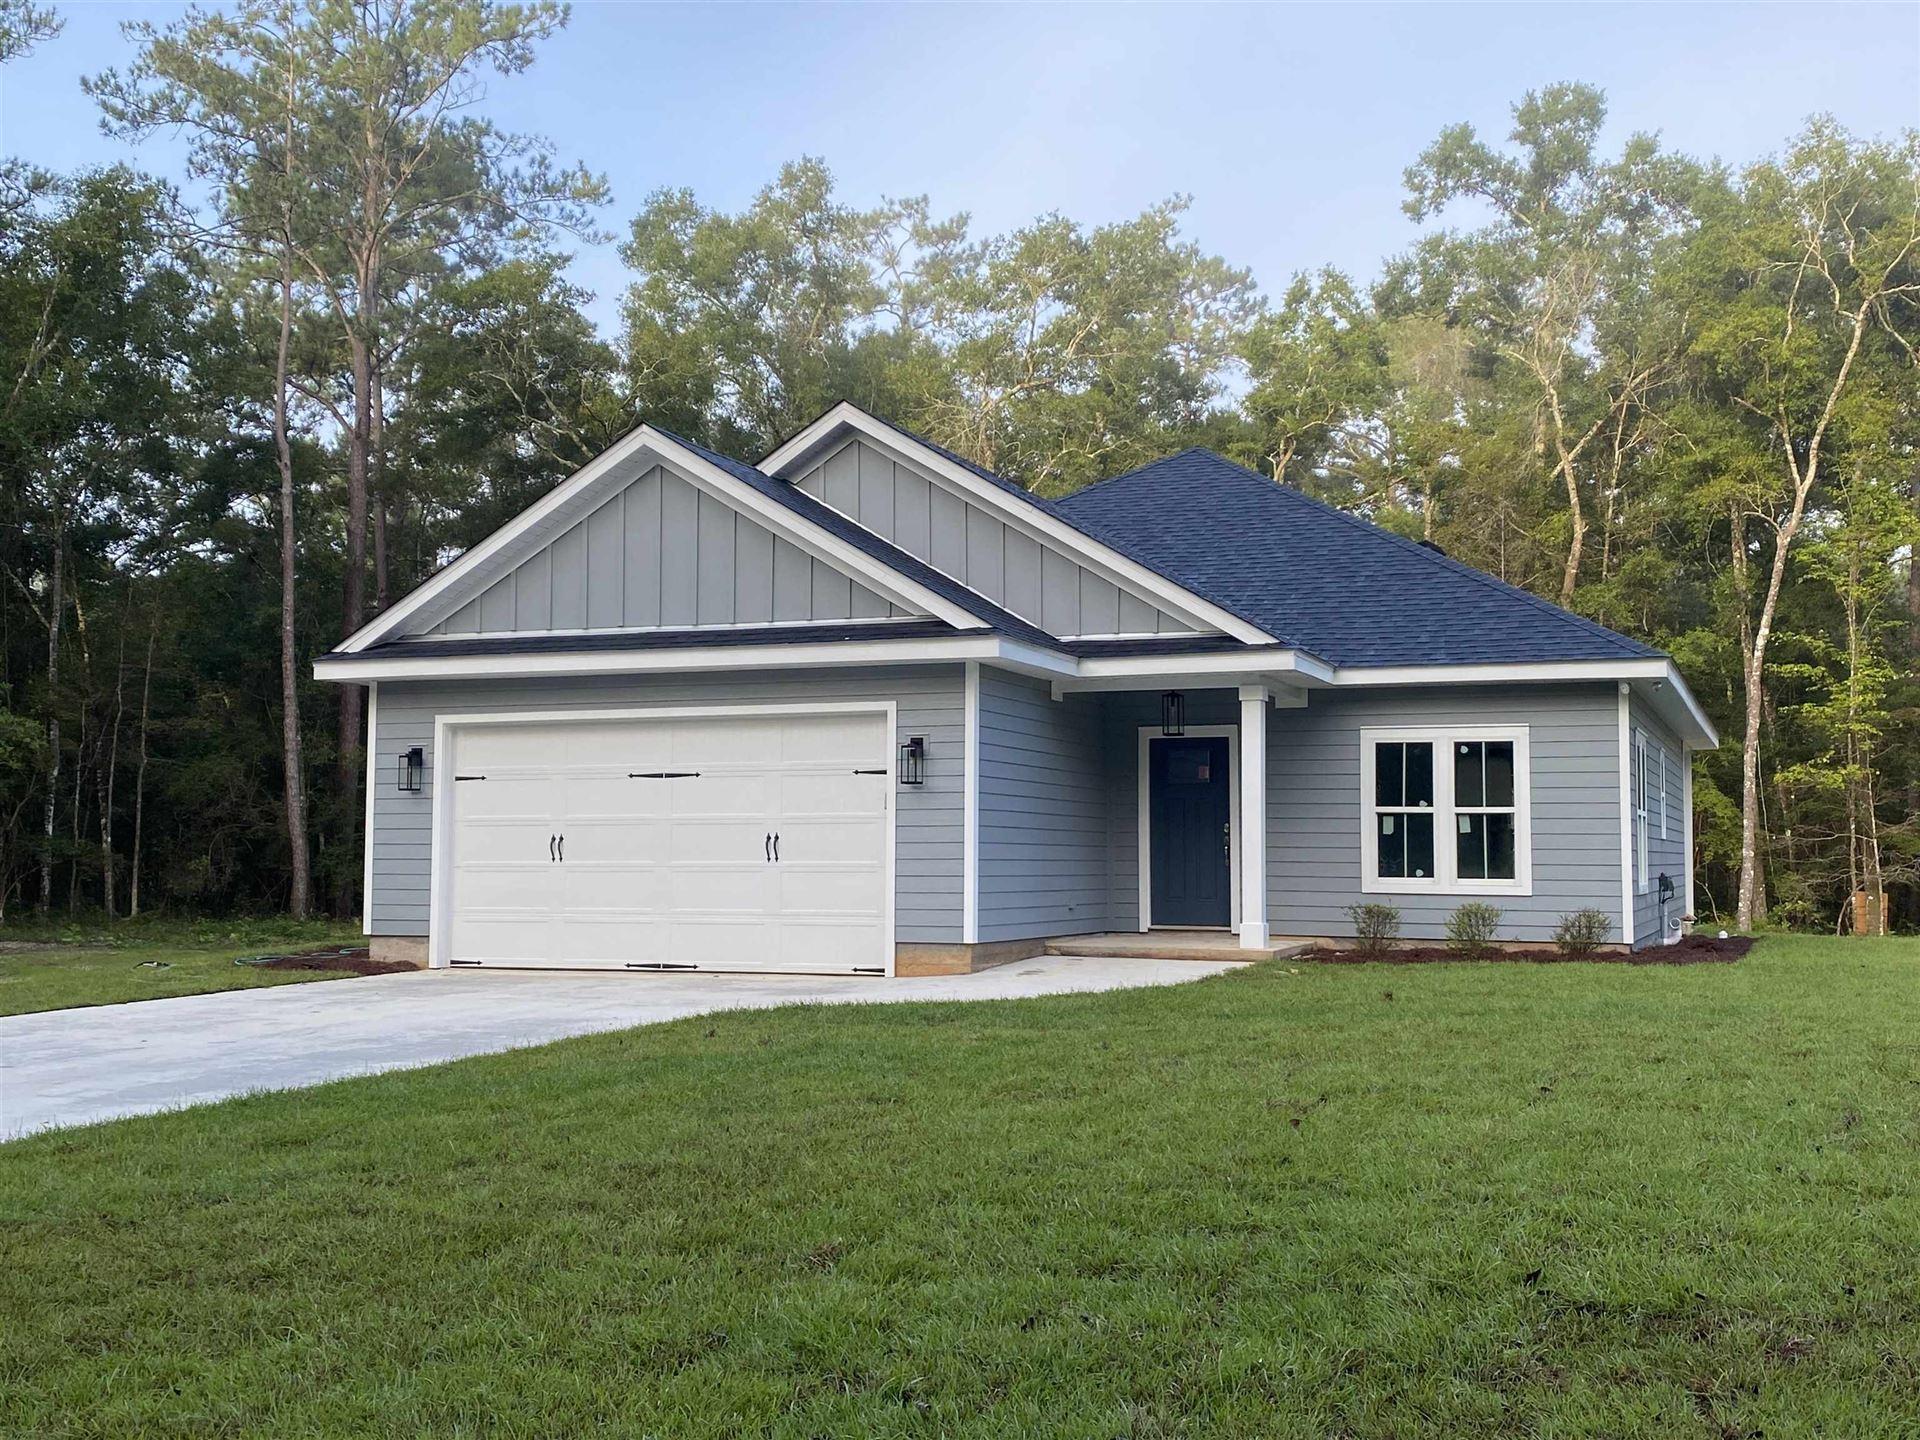 Photo of 12680 Roalde Road, TALLAHASSEE, FL 32317 (MLS # 332793)